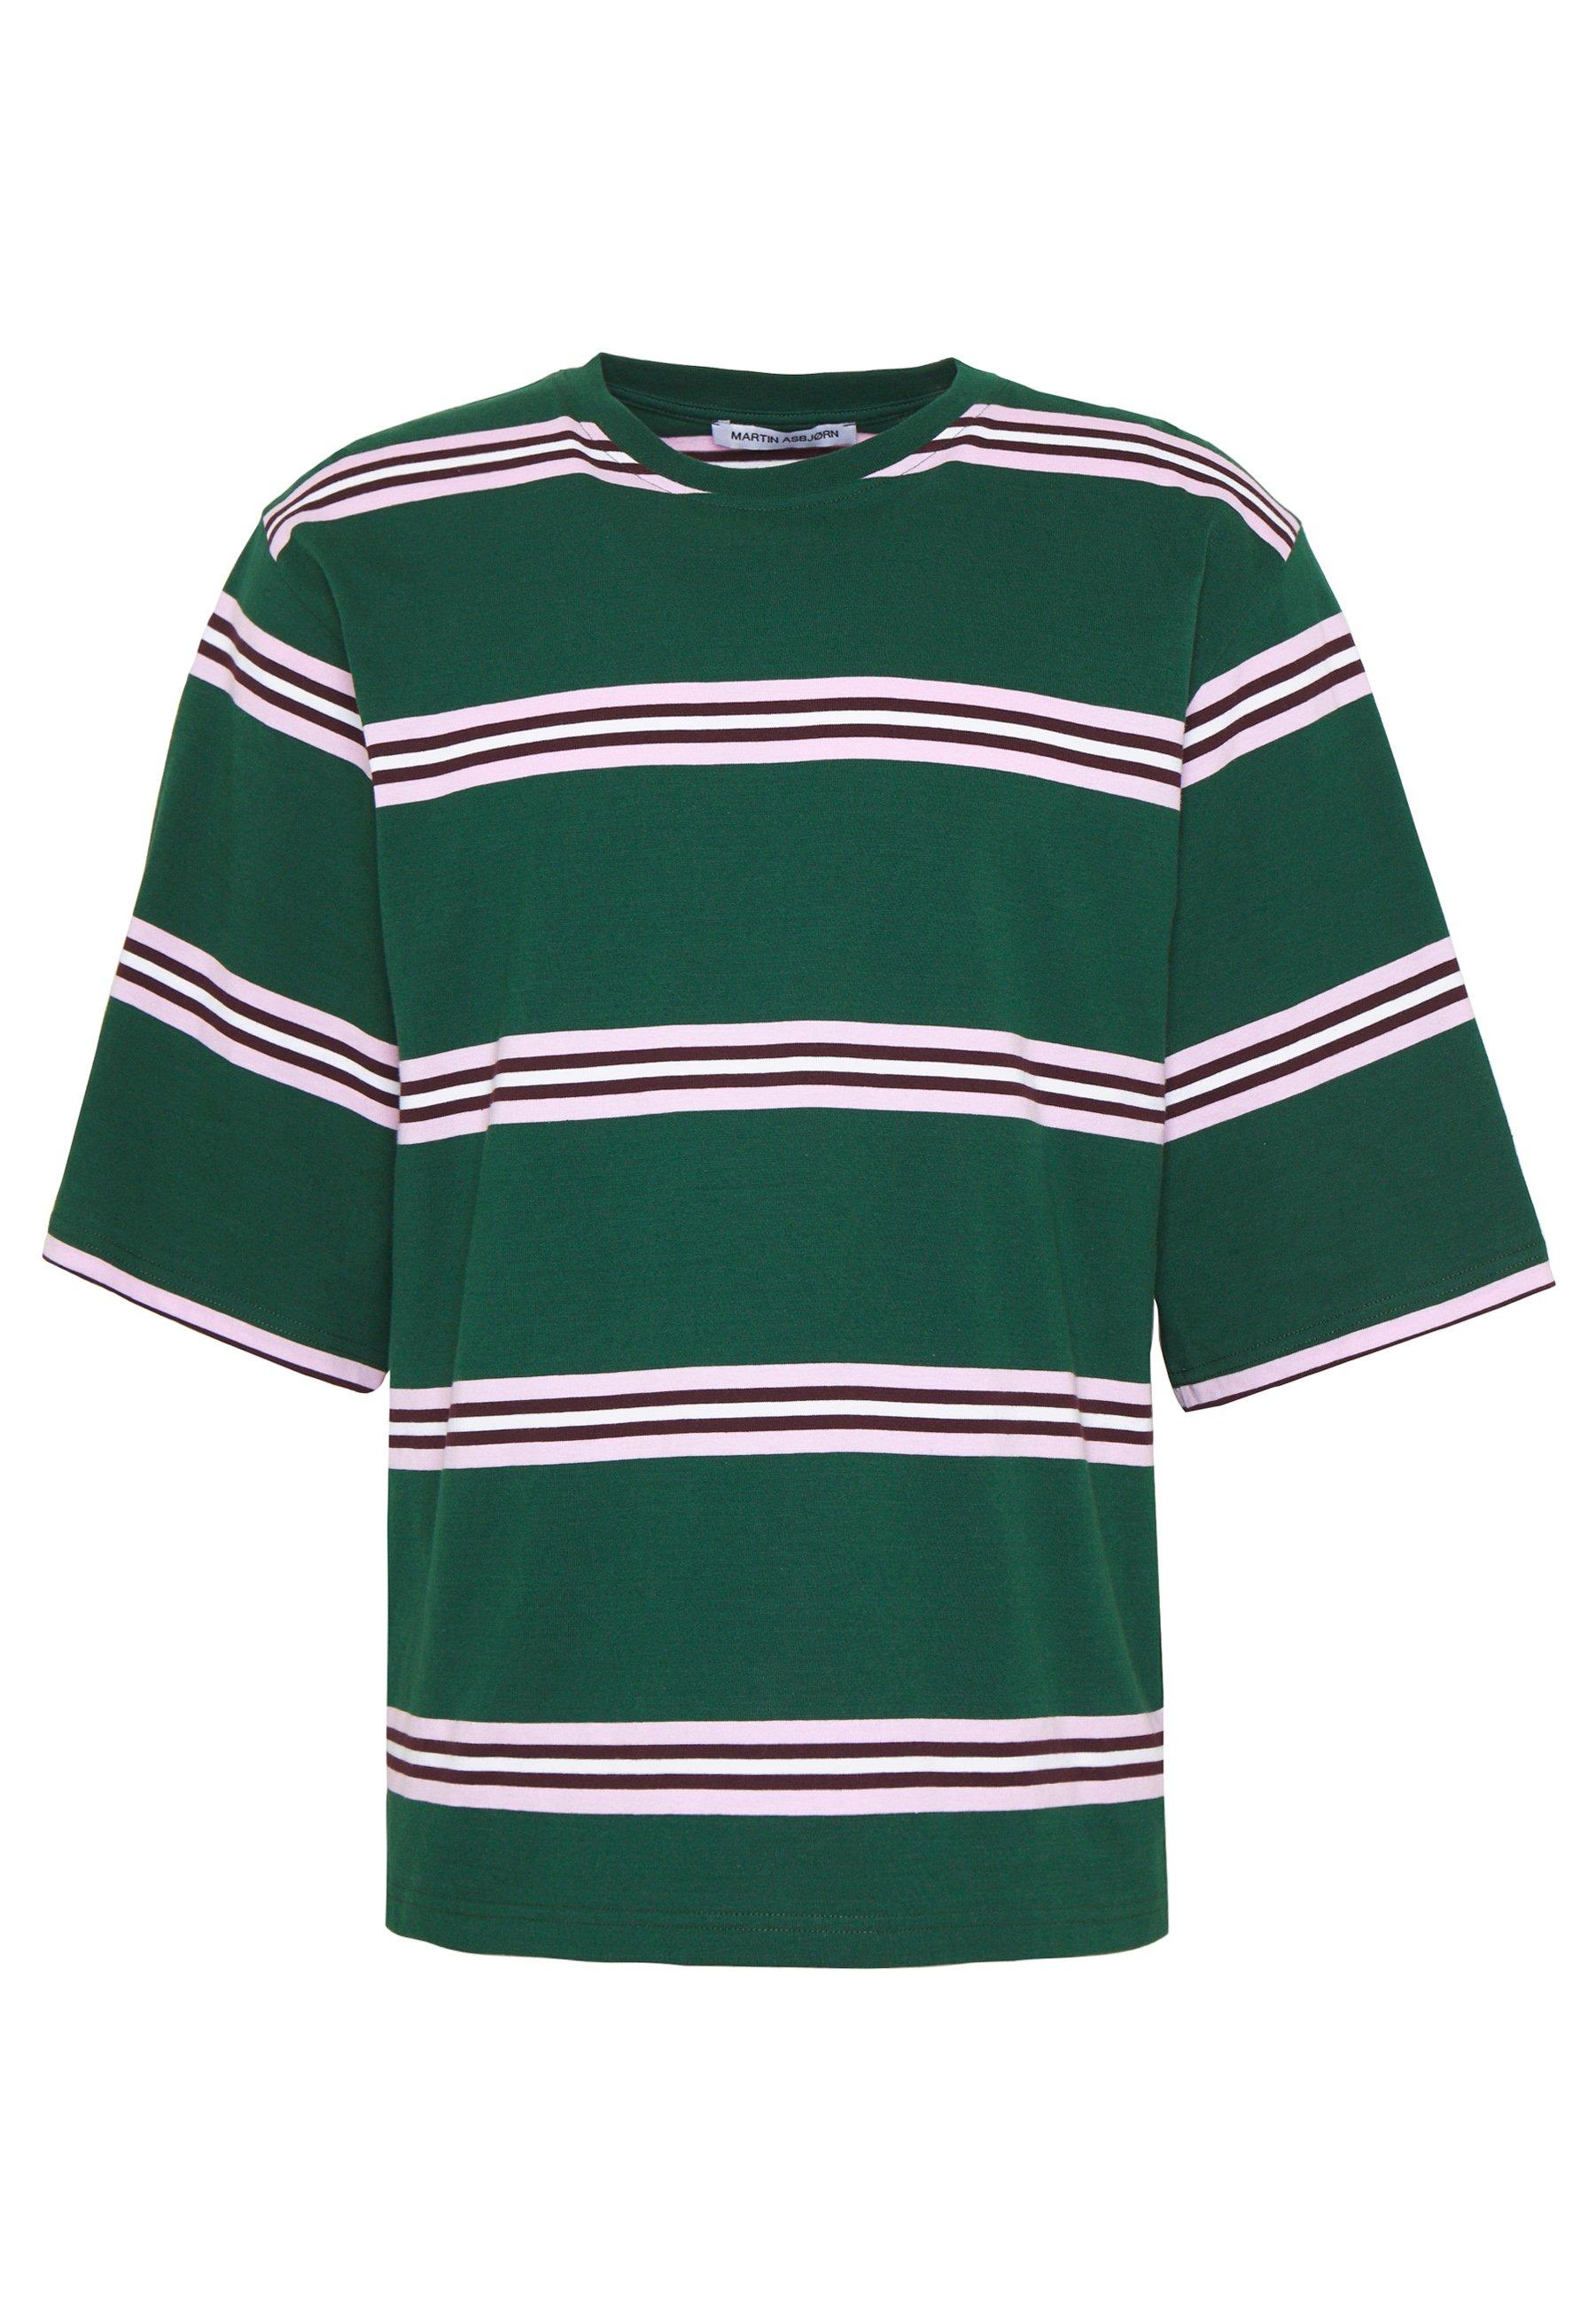 Martin Asbjørn Nick Tee - T-shirt Med Print Evergreen Stripe